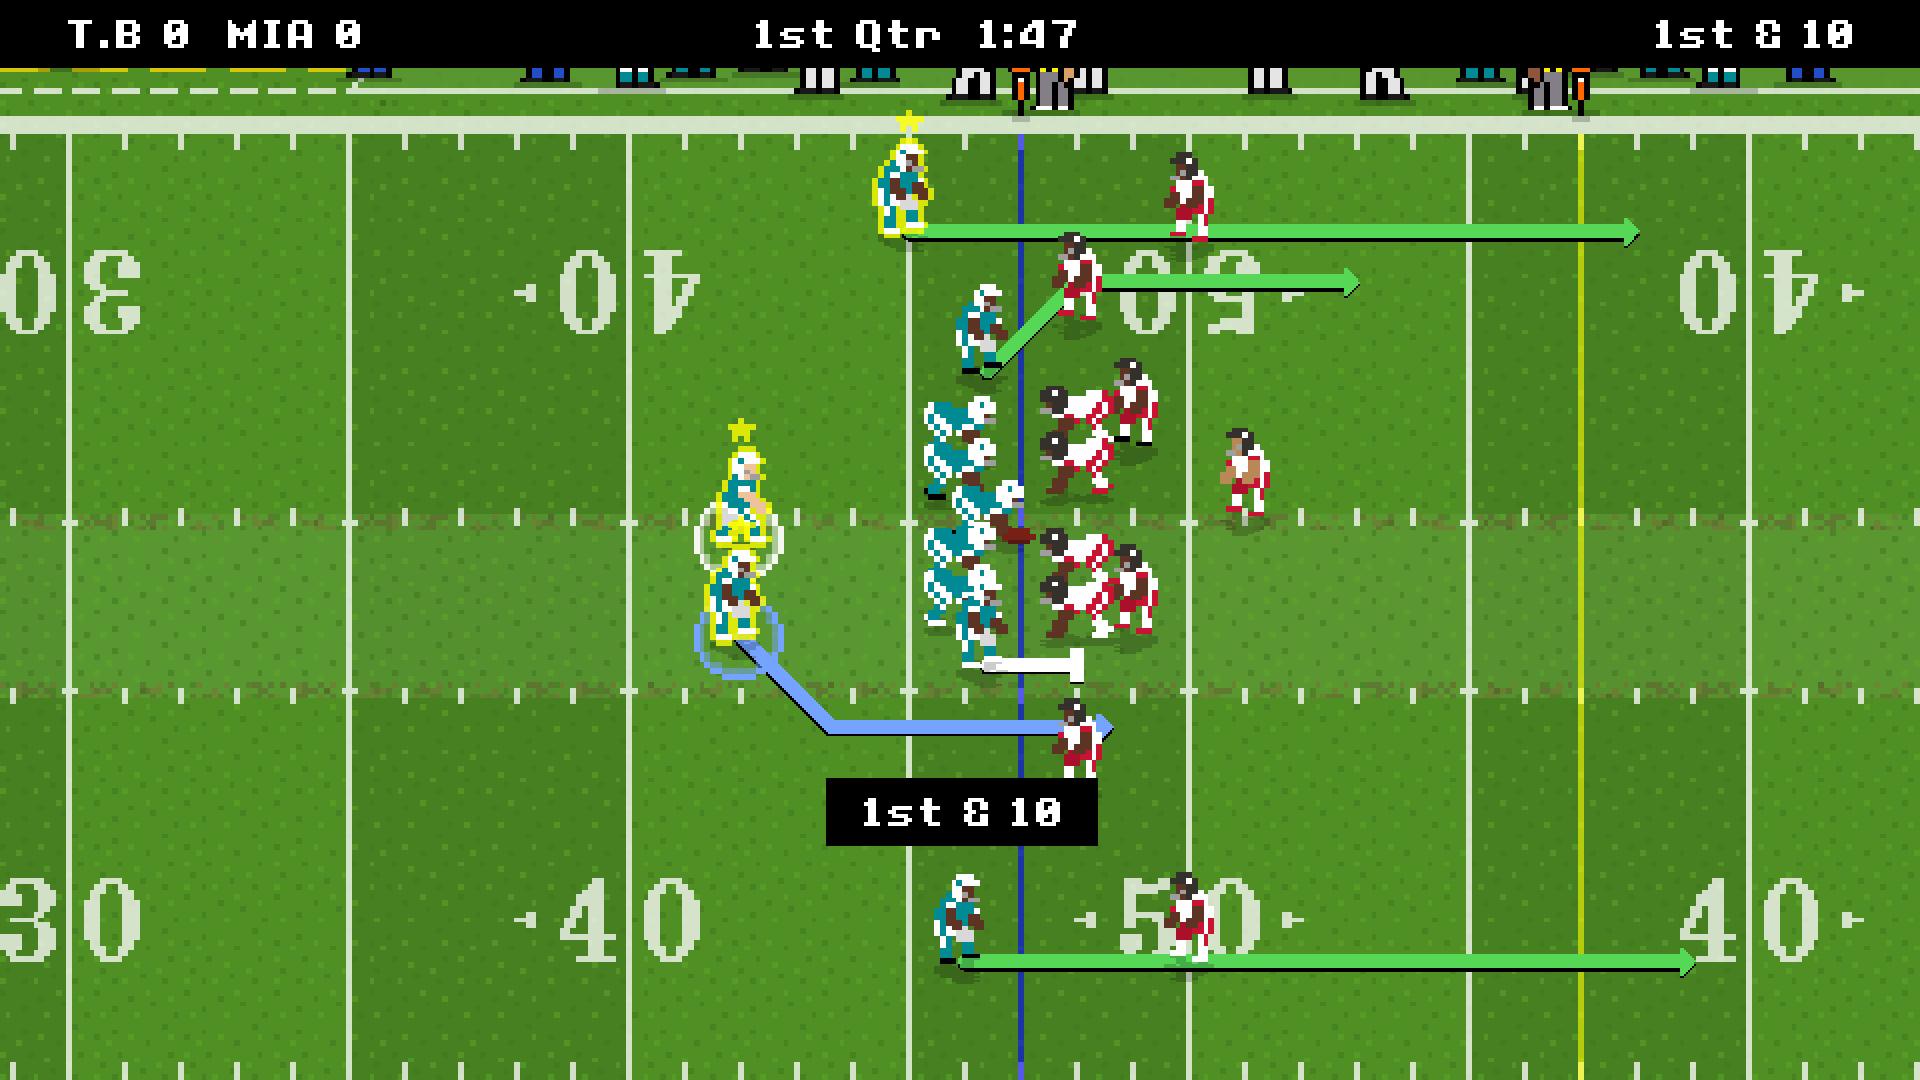 Retro Bowl Online